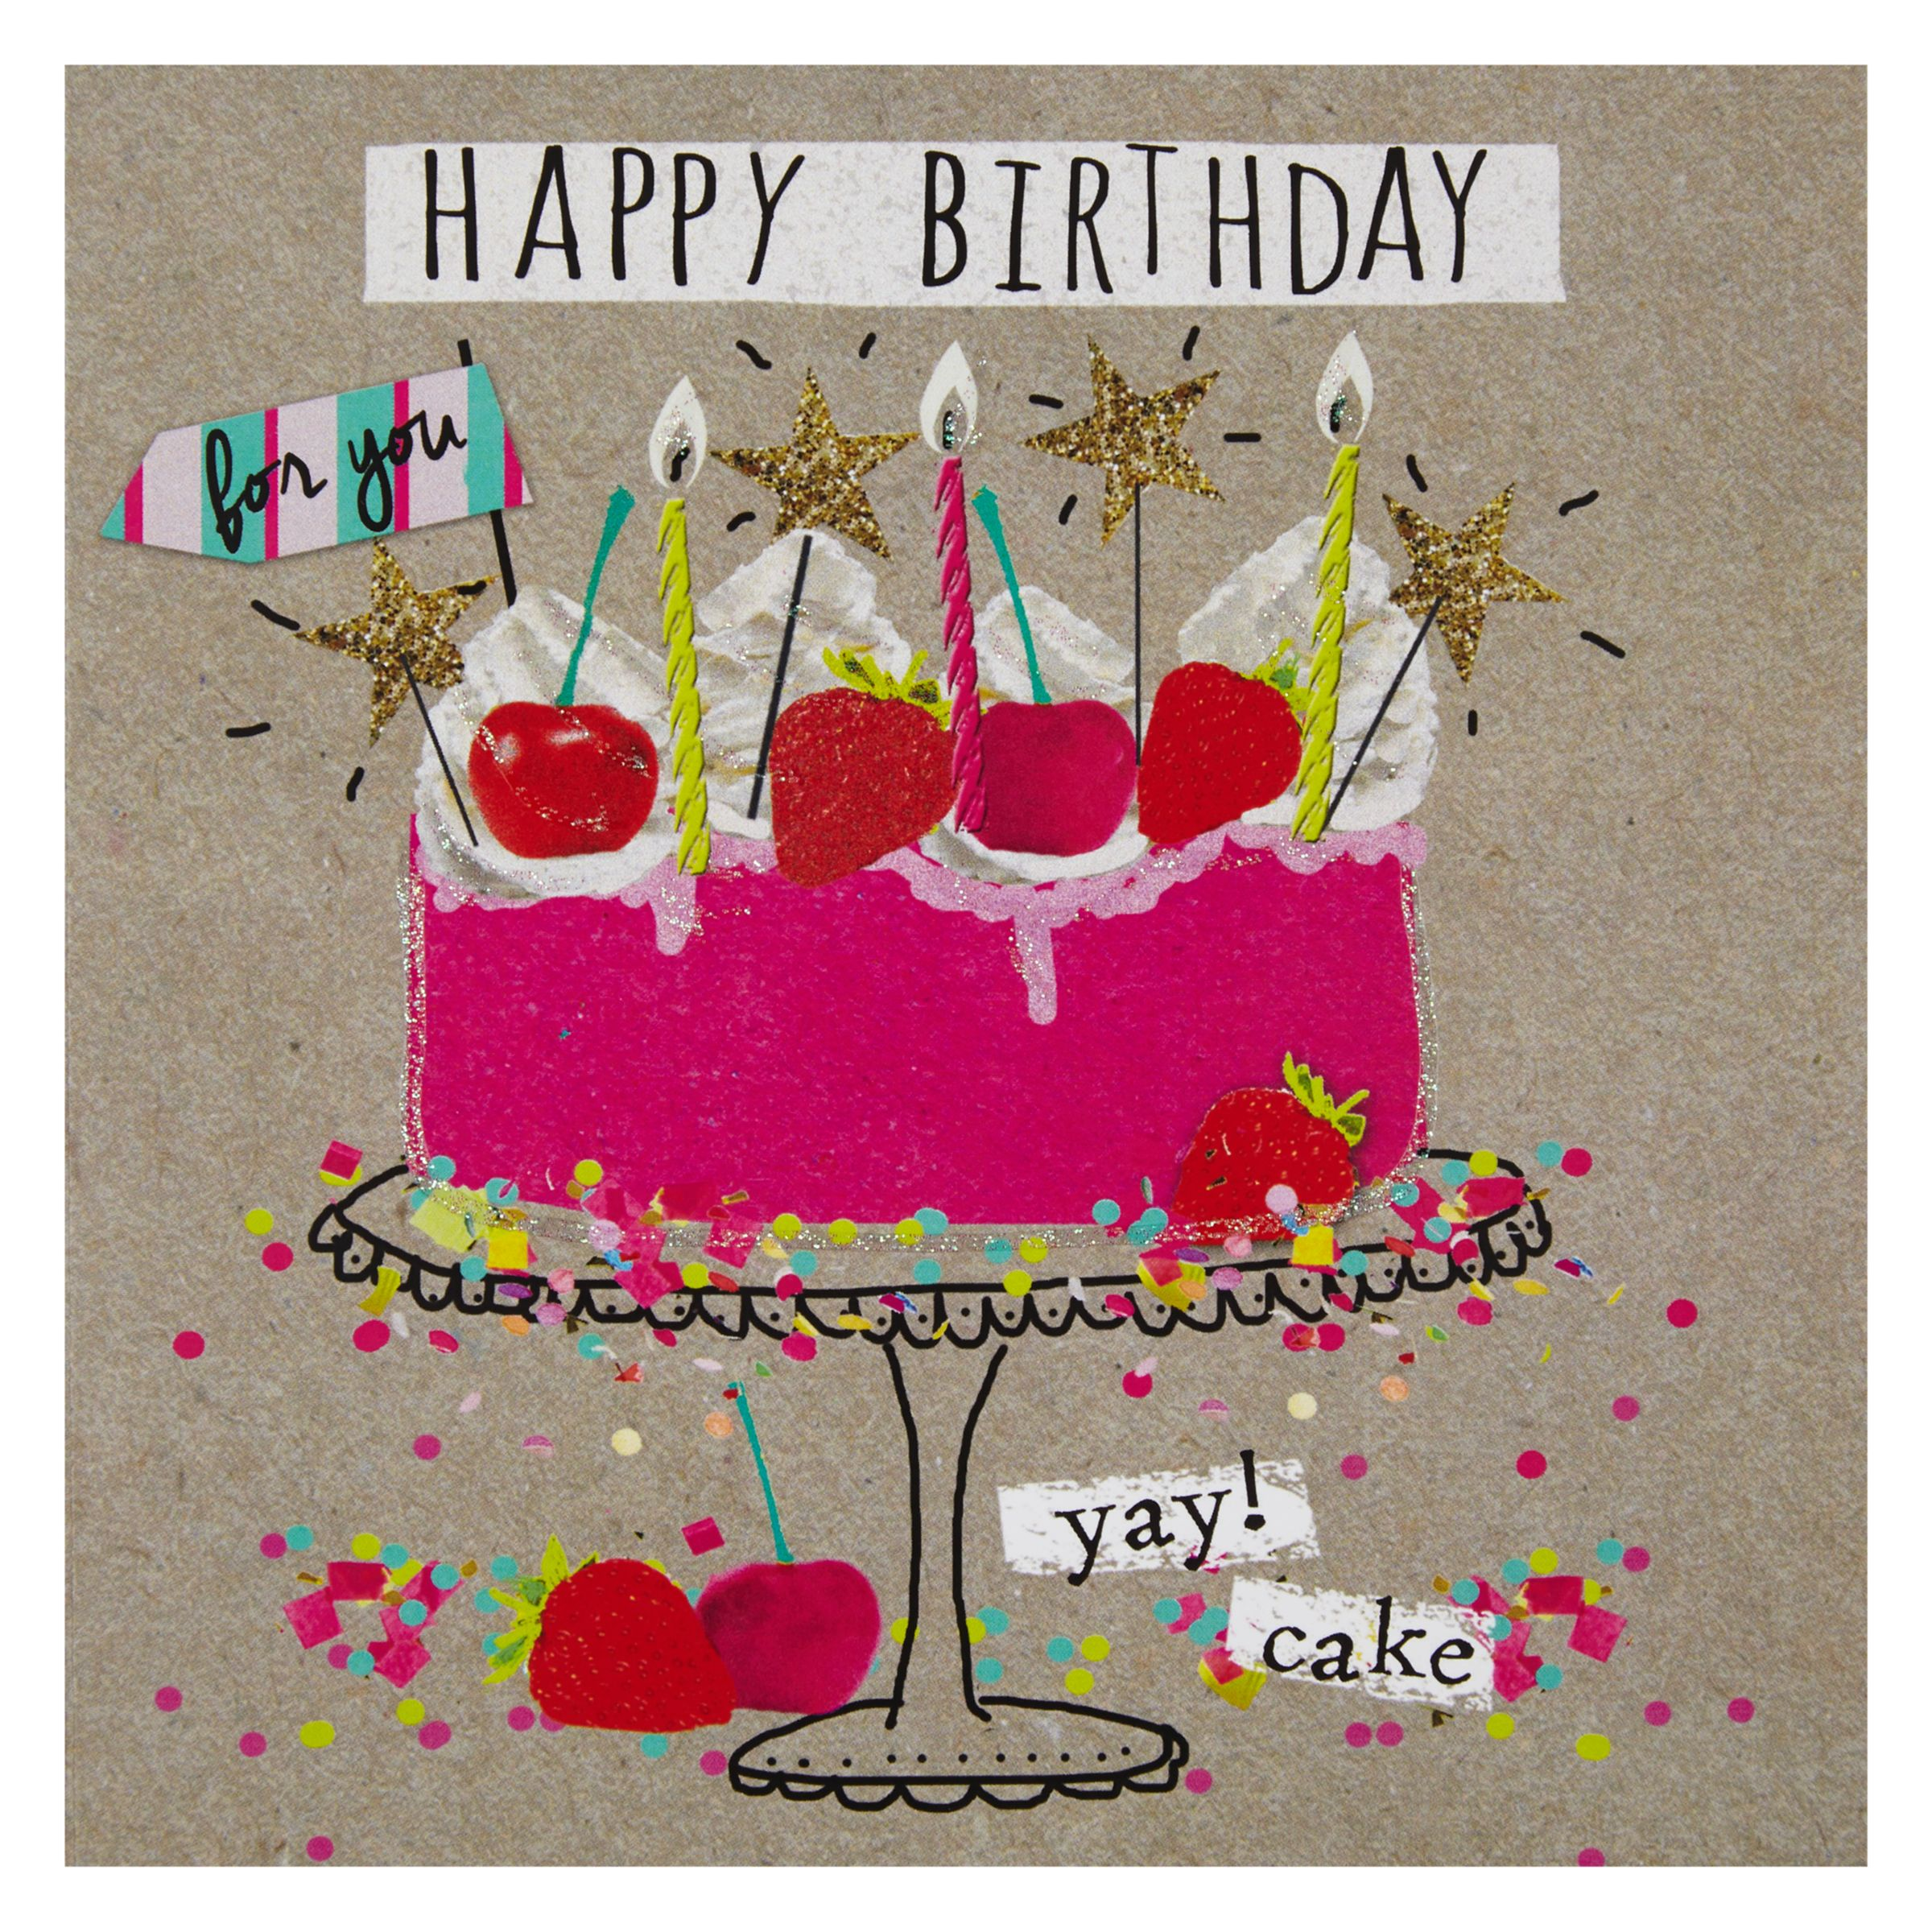 Birthday Cake John Lewis : Buy Hammond Gower Birthday Cake Card John Lewis